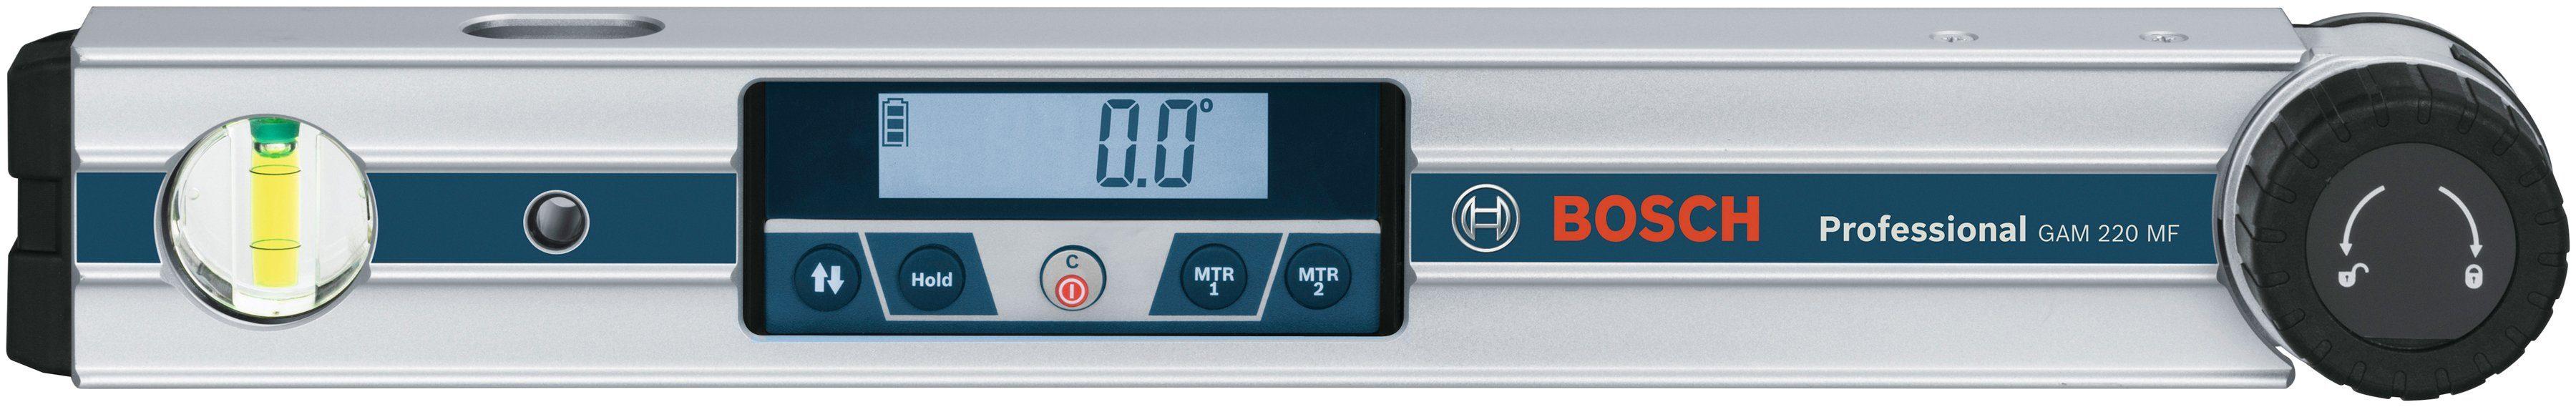 Bosch Professional Winkelmesser »GAM 220 MF«